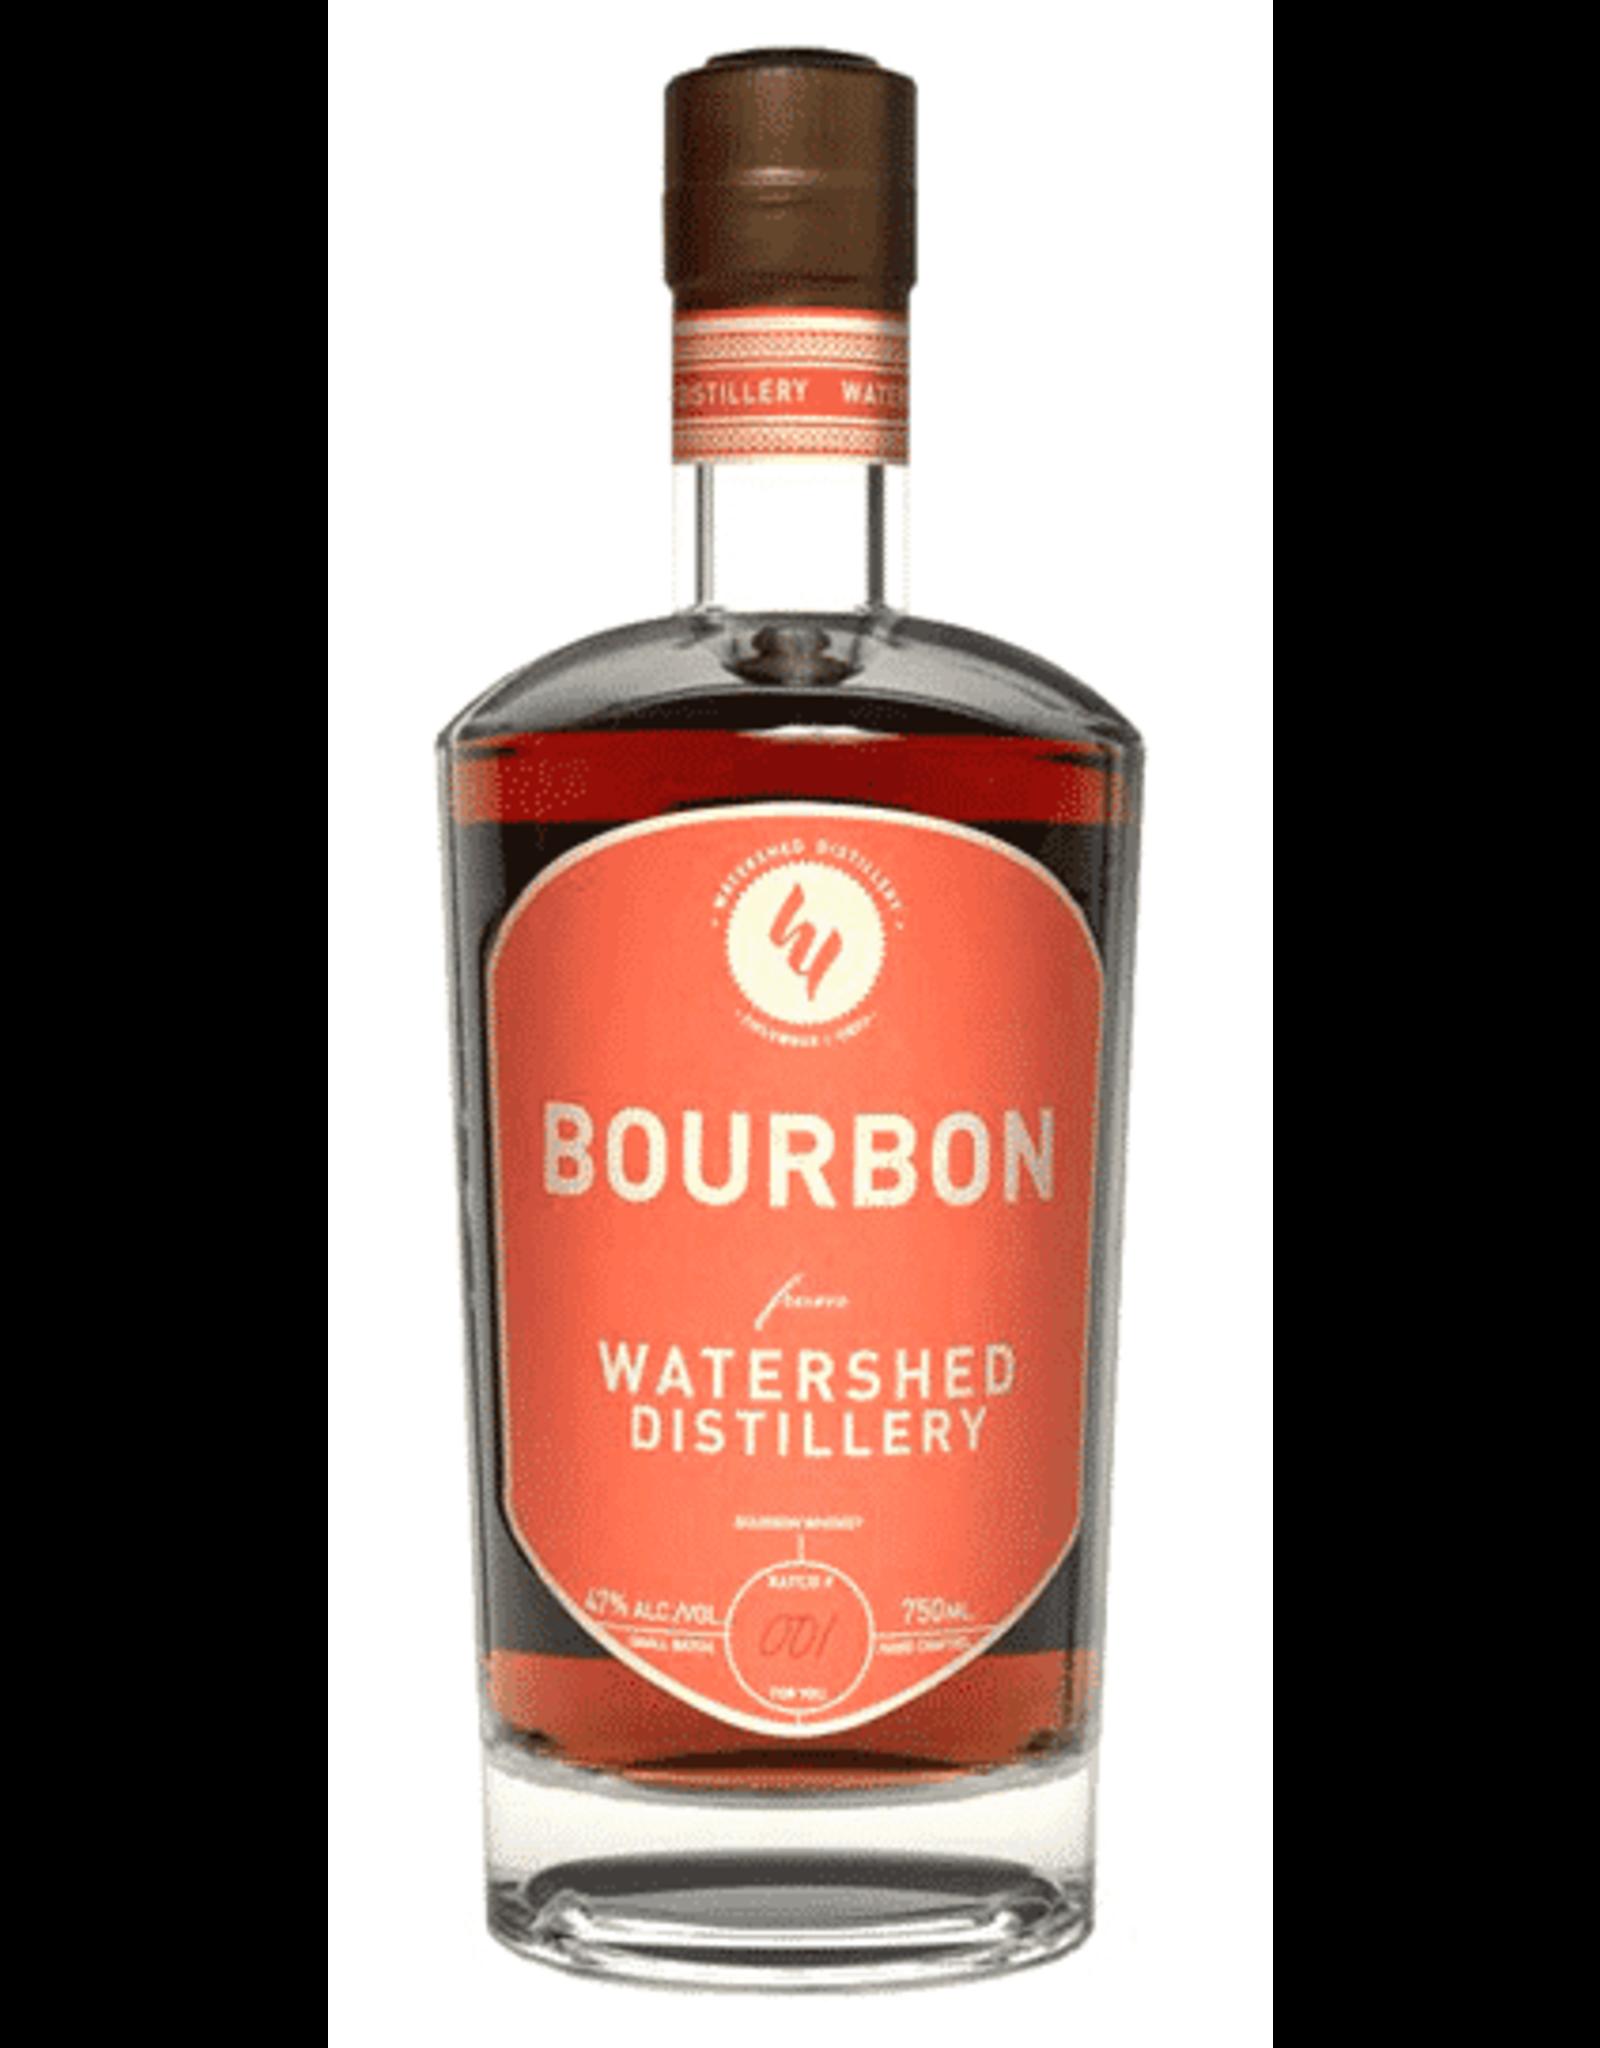 Watershed Distillery Bourbon